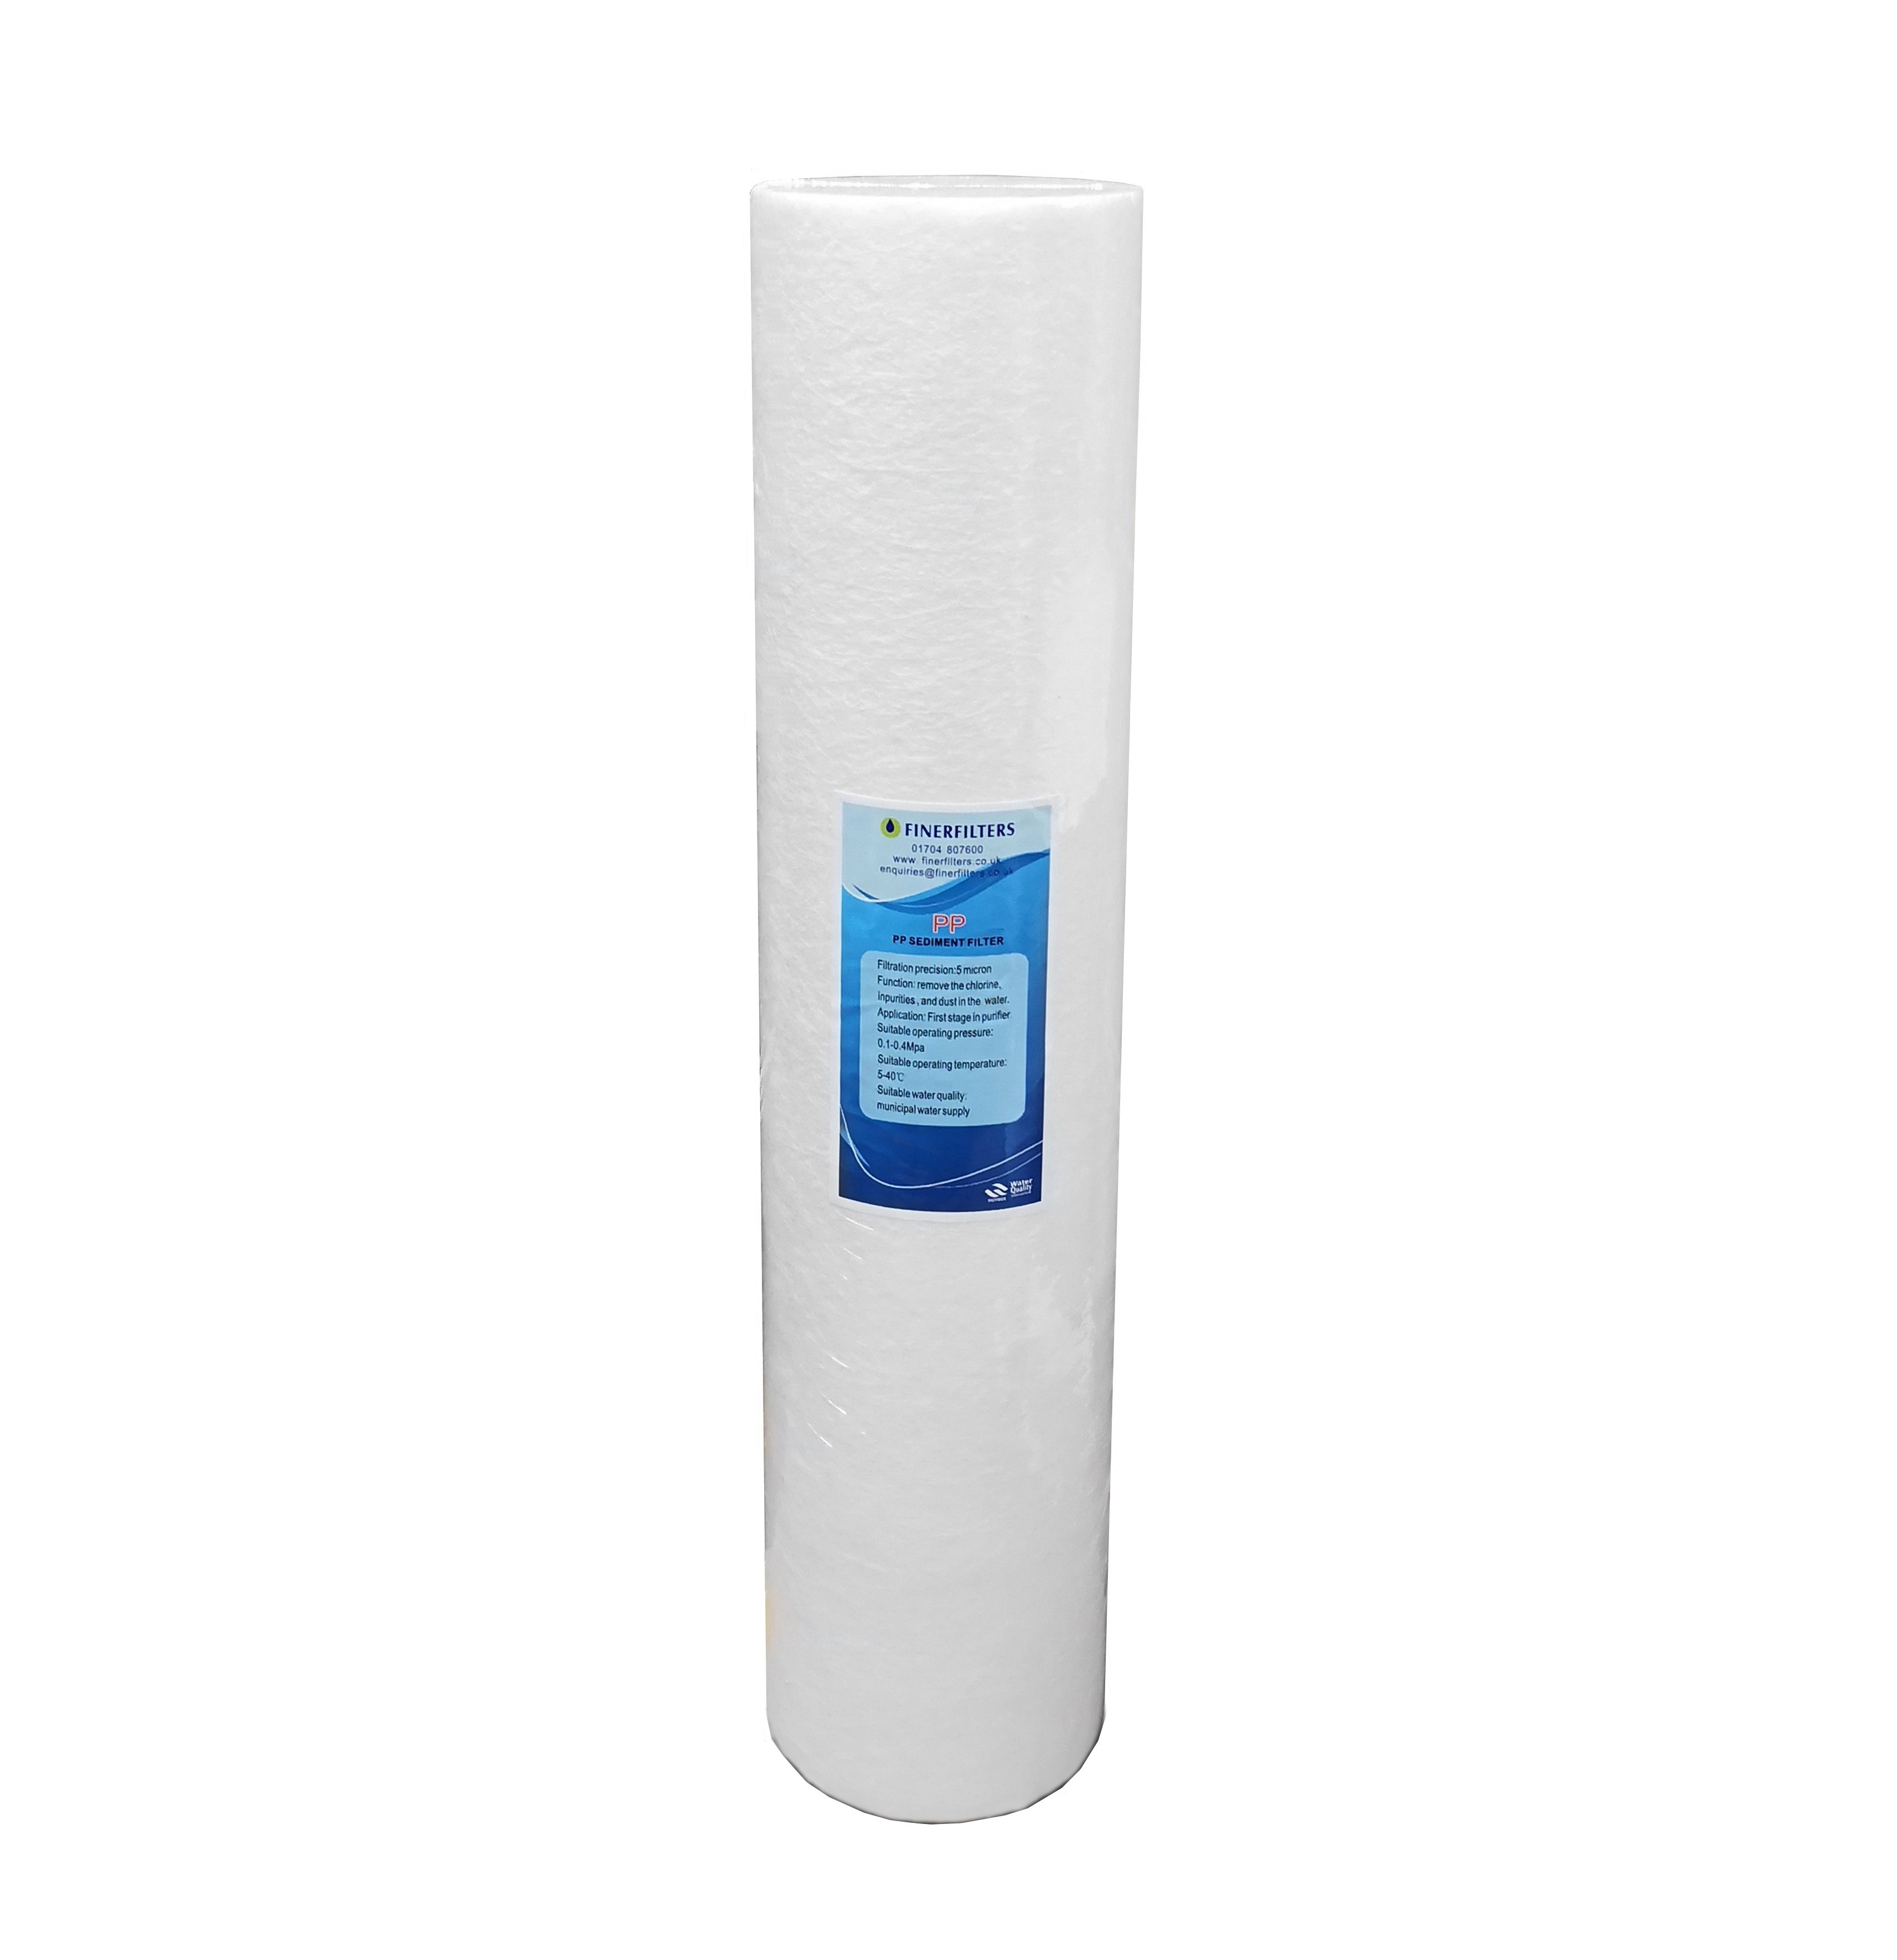 "Finerfilters Jumbo 20"" x 4.5"" 5 Micron Spun Polypropylene Sediment Filter"